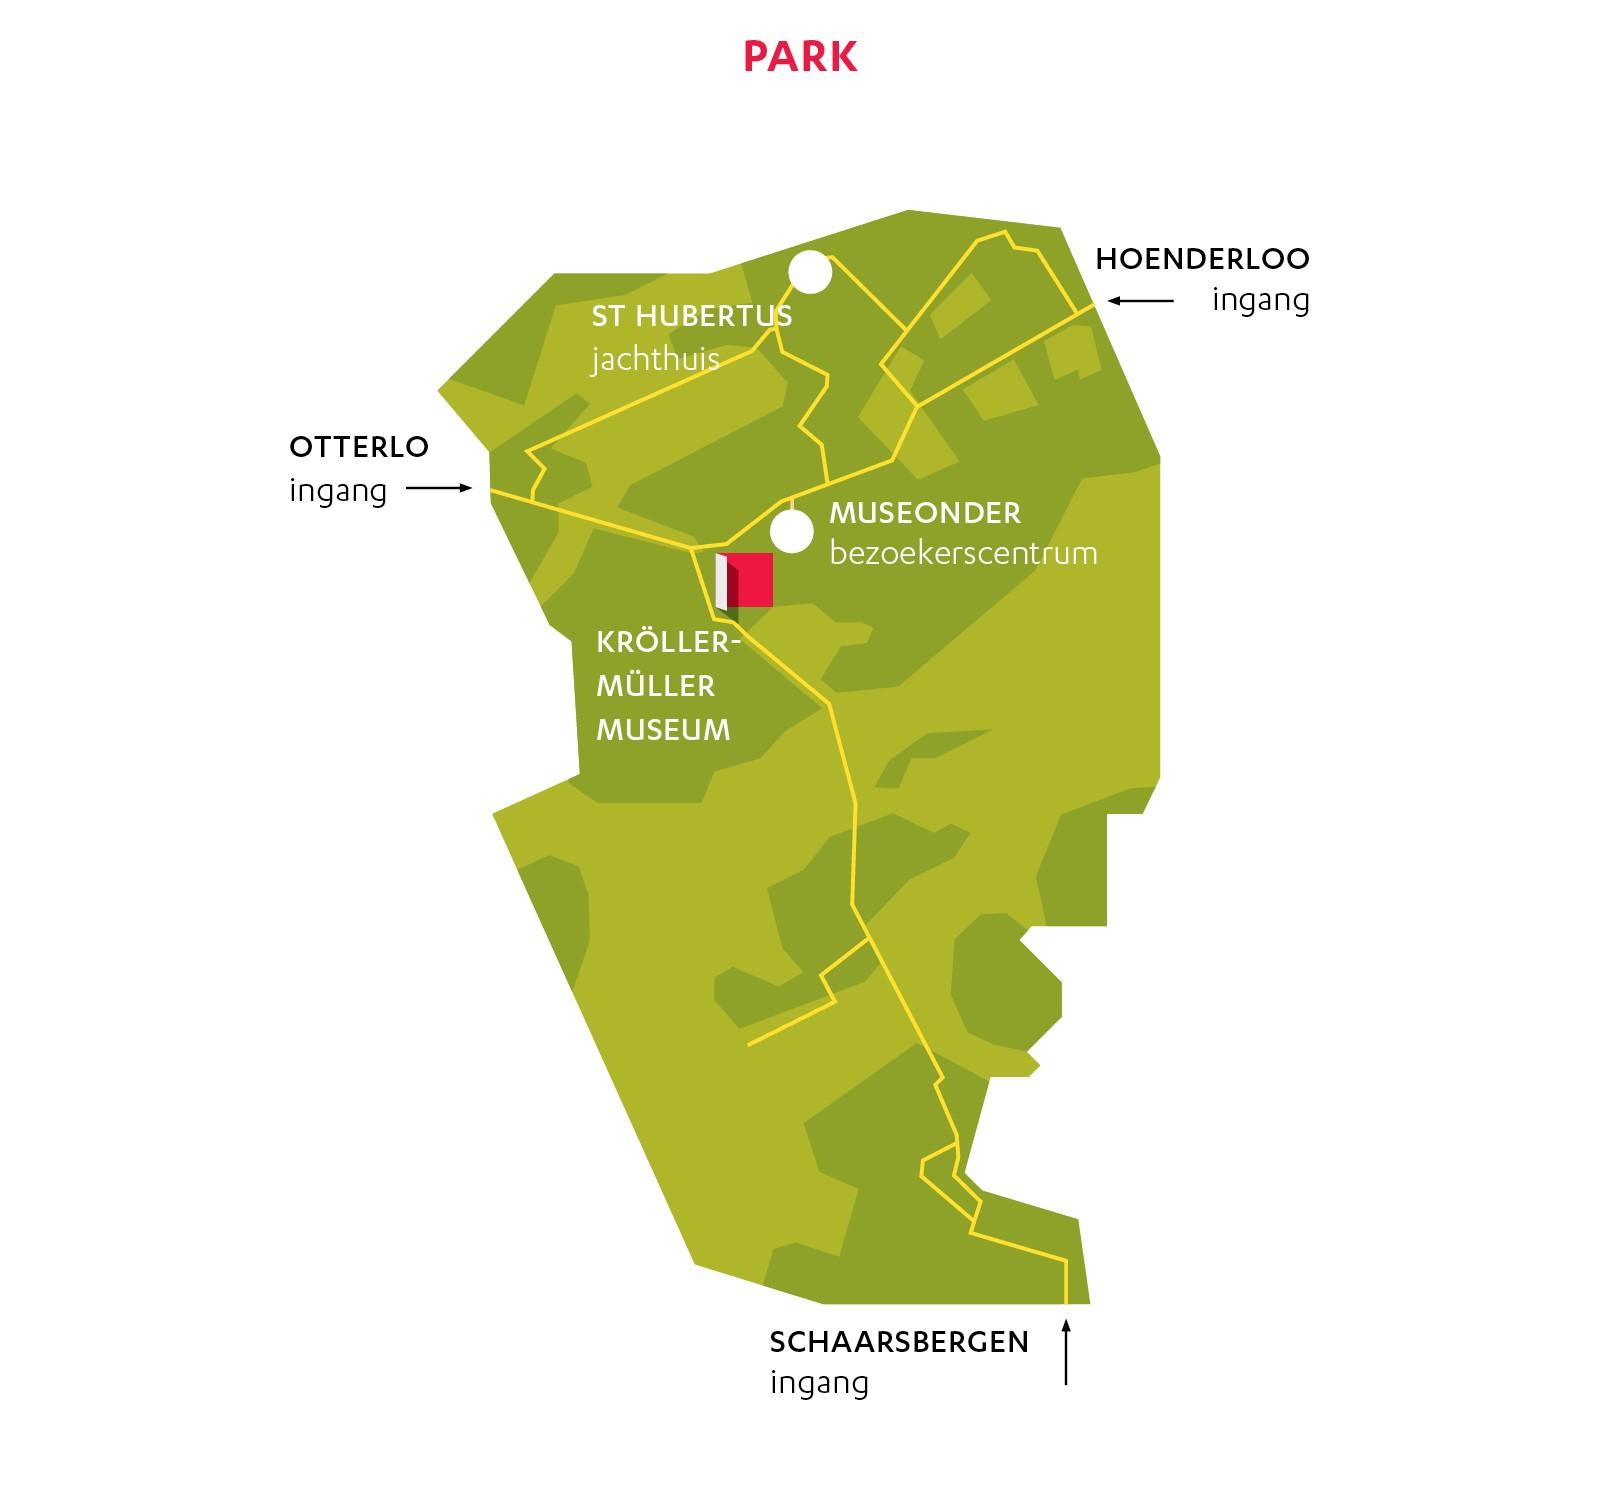 met museum map jpg with Park De Hoge Veluwe on amersfoort Zoo likewise Nemrut Dagi Adiyaman together with Park De Hoge Veluwe besides 04575 also High Resolution Maps.